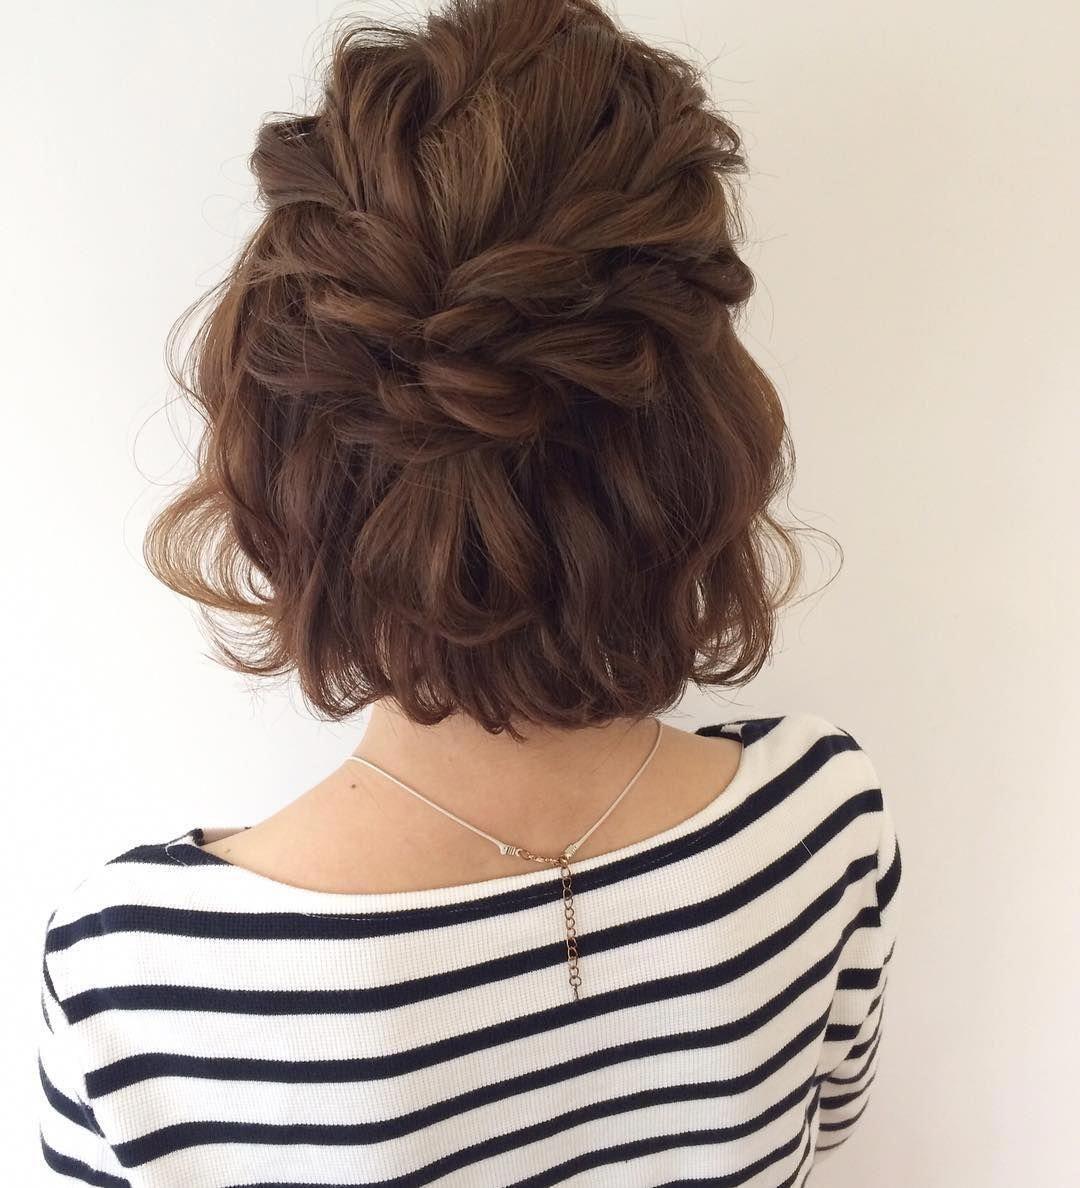 Pretty Braided Half Up Style For Bridesmaids With Short Hair Wavyhair Short Wedding Hair Short Hair Updo Half Updo Hairstyles